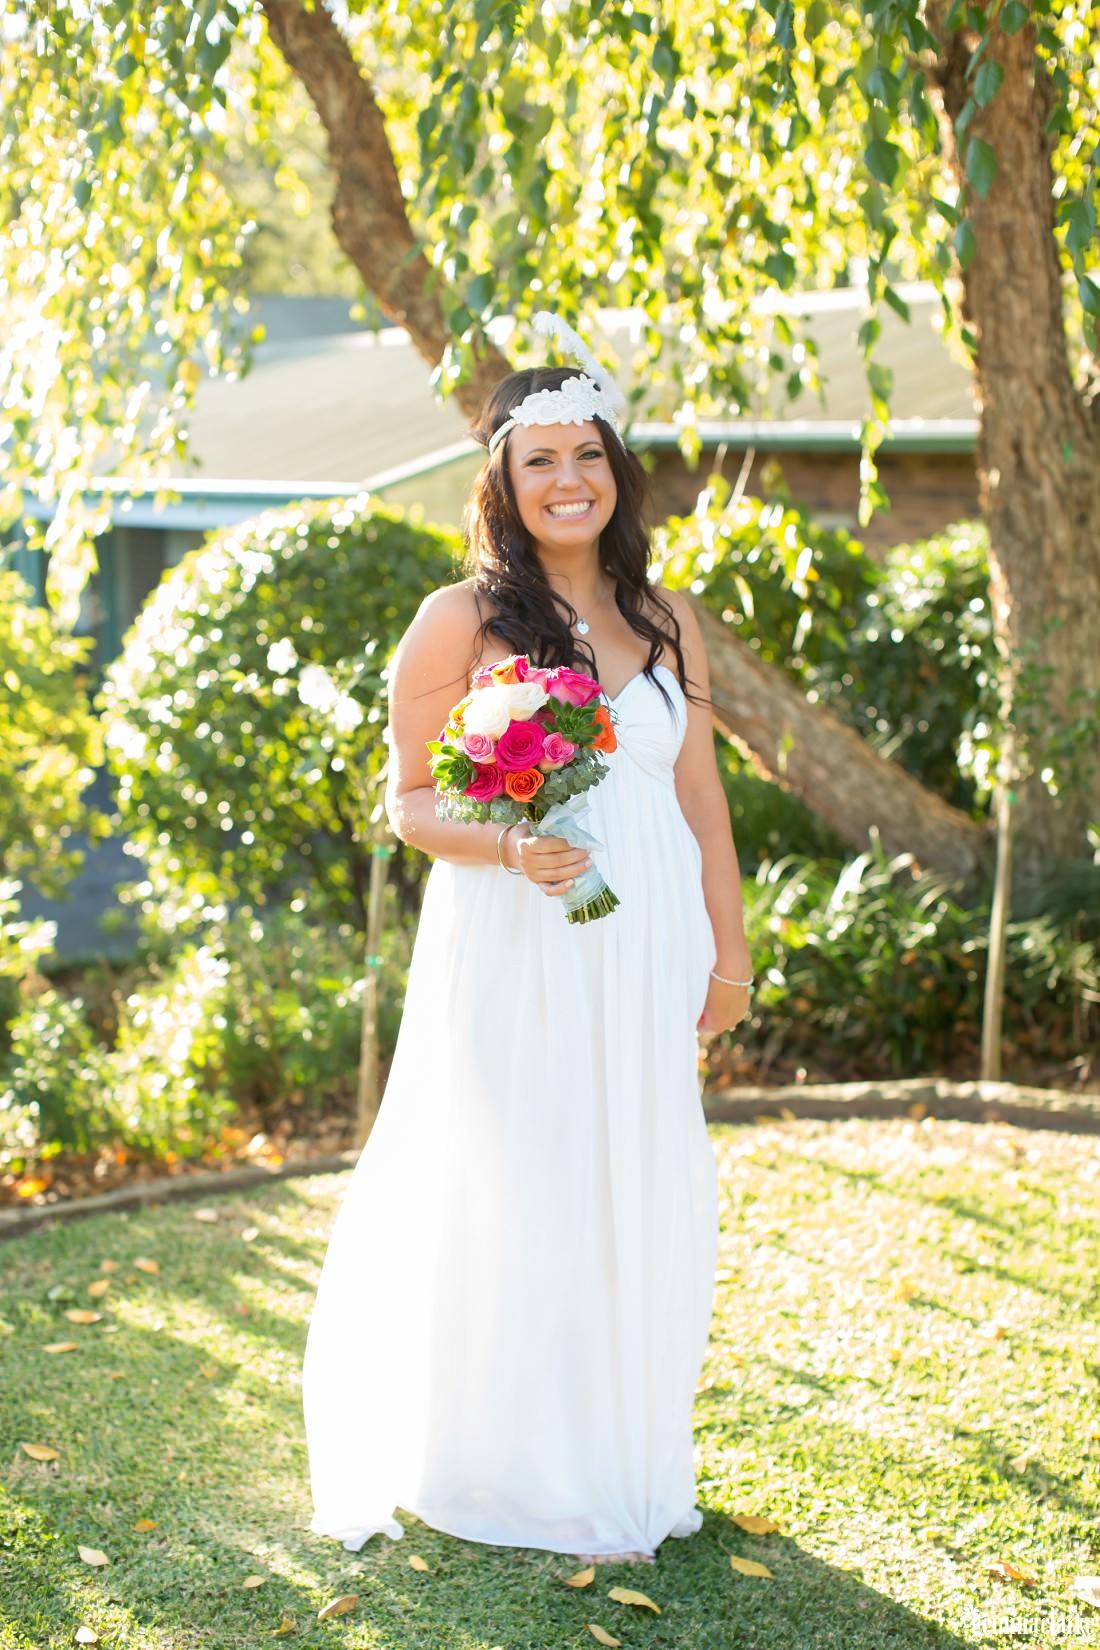 gemmaclarkephotography_bridal-portraits_pennant-hills-golf-club-wedding_hannah-and-ben_0007